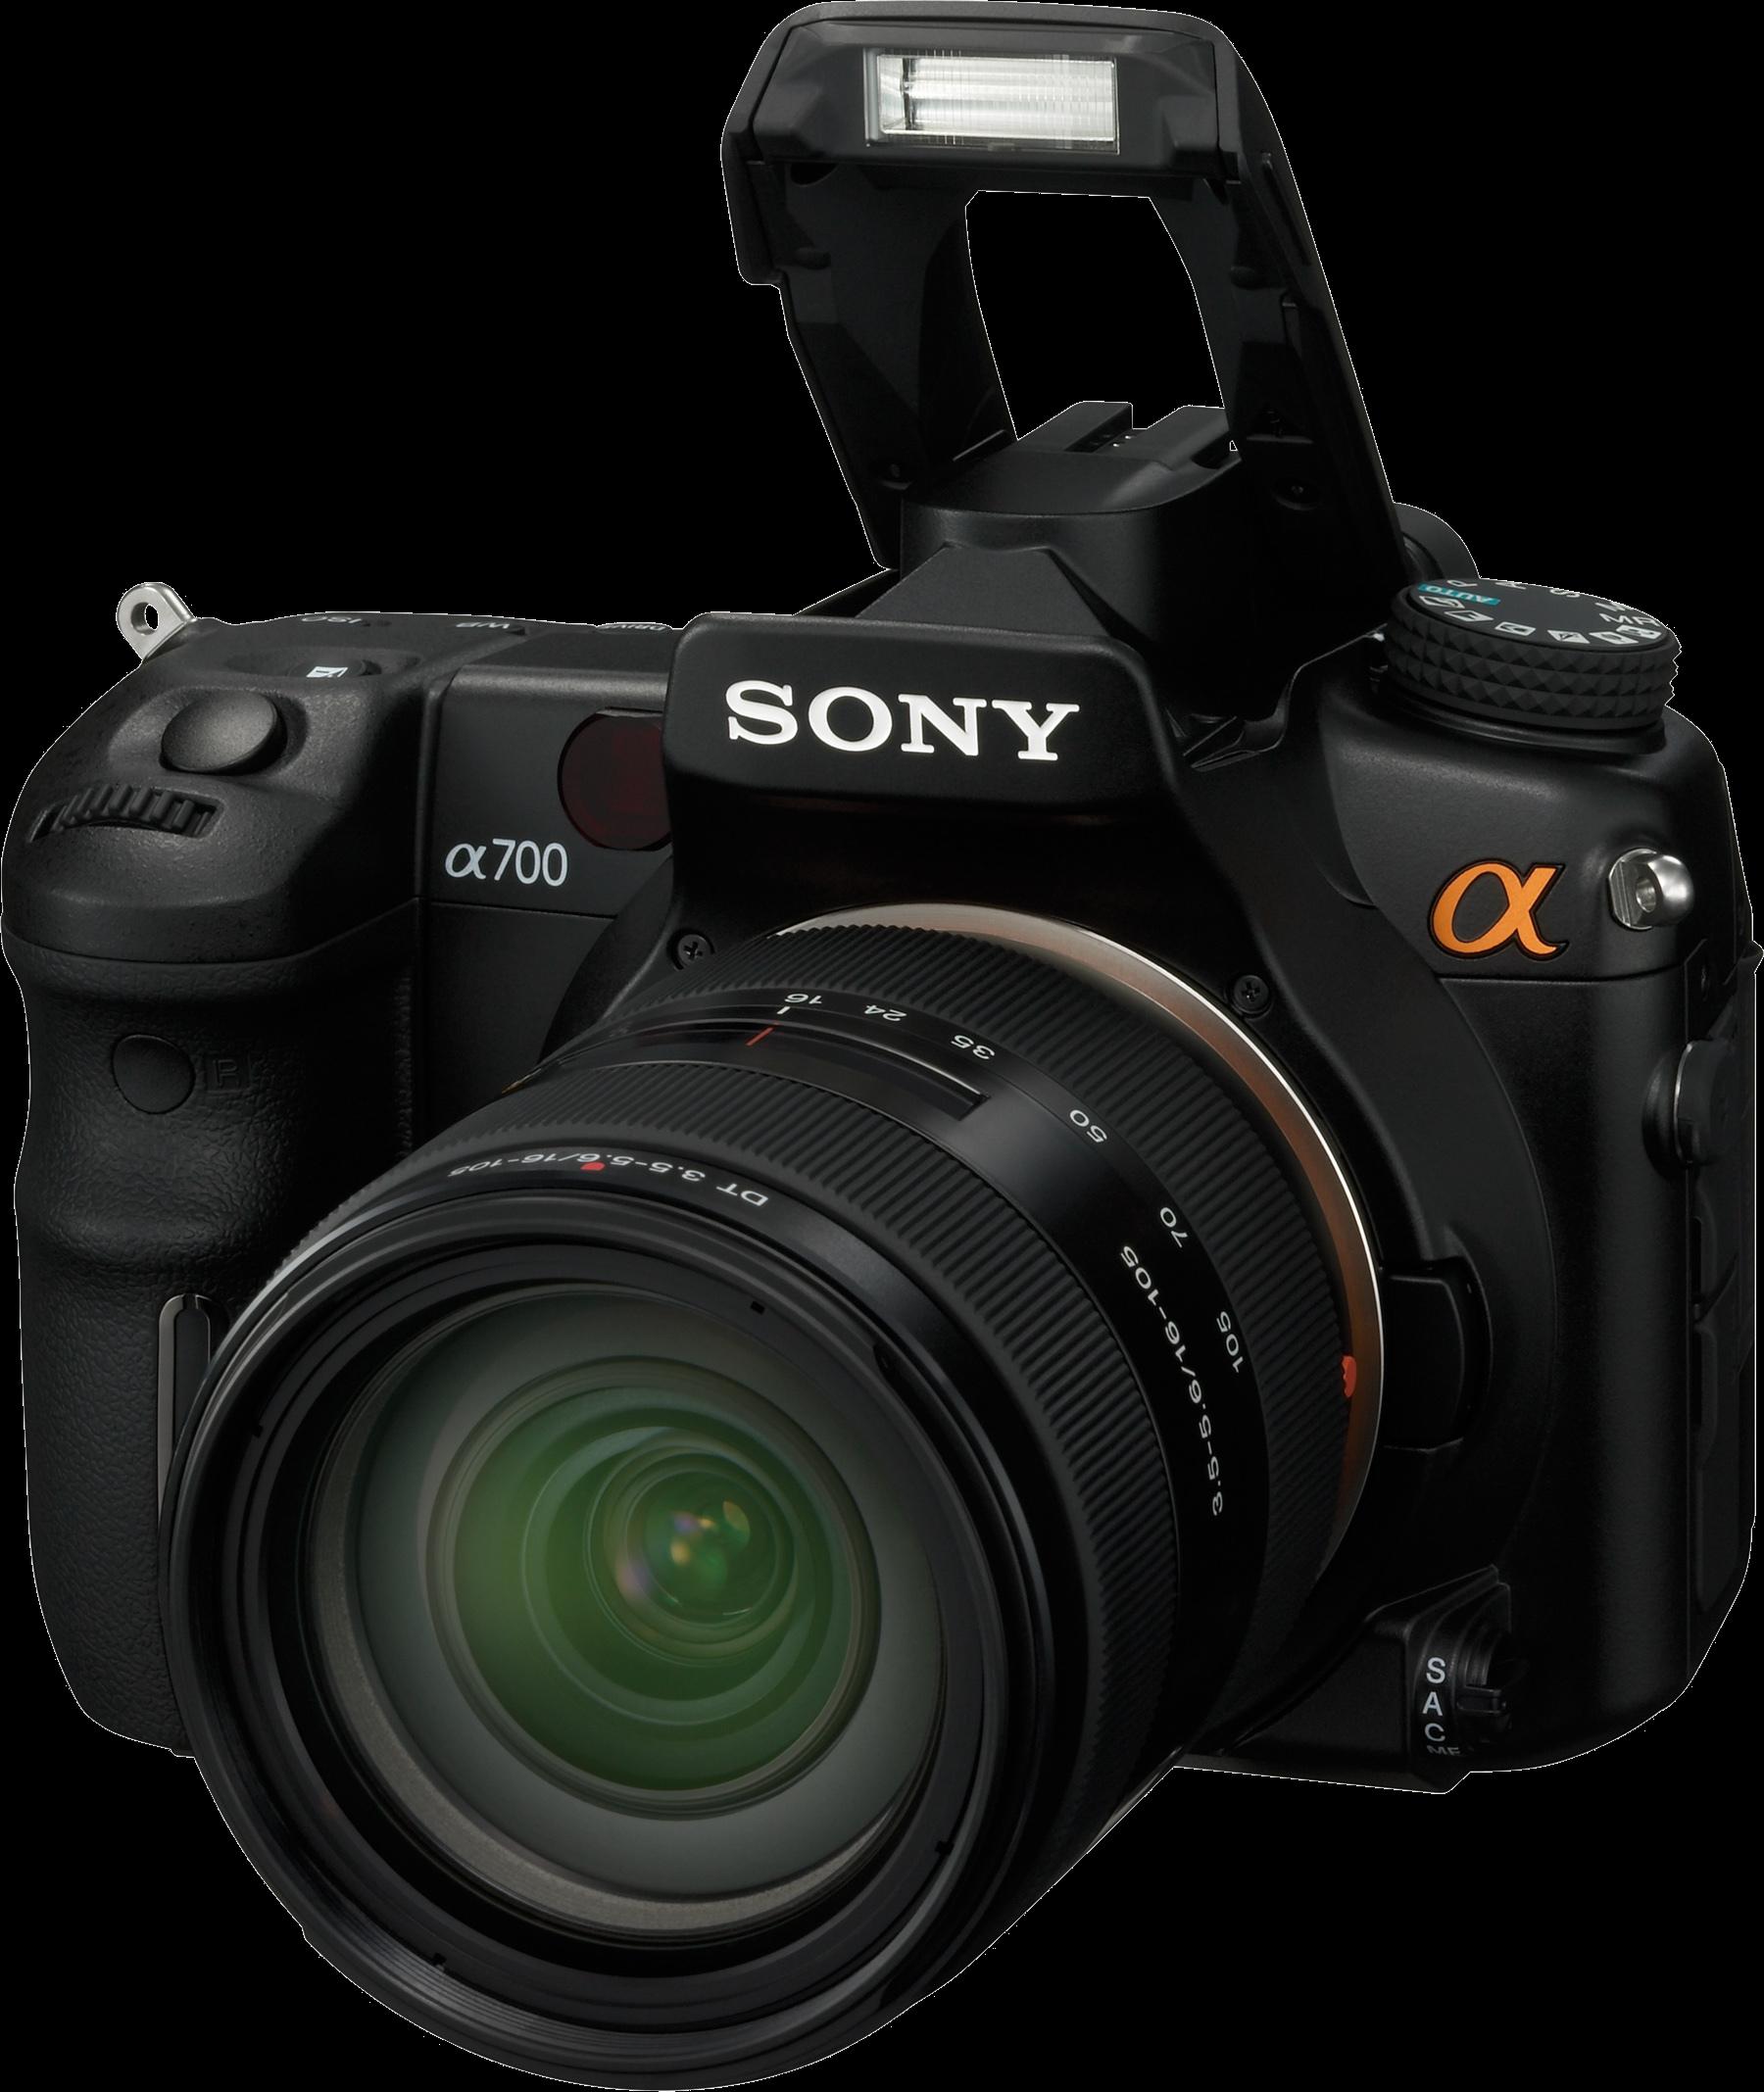 Download Dslr Camera Clipart Png () png images.